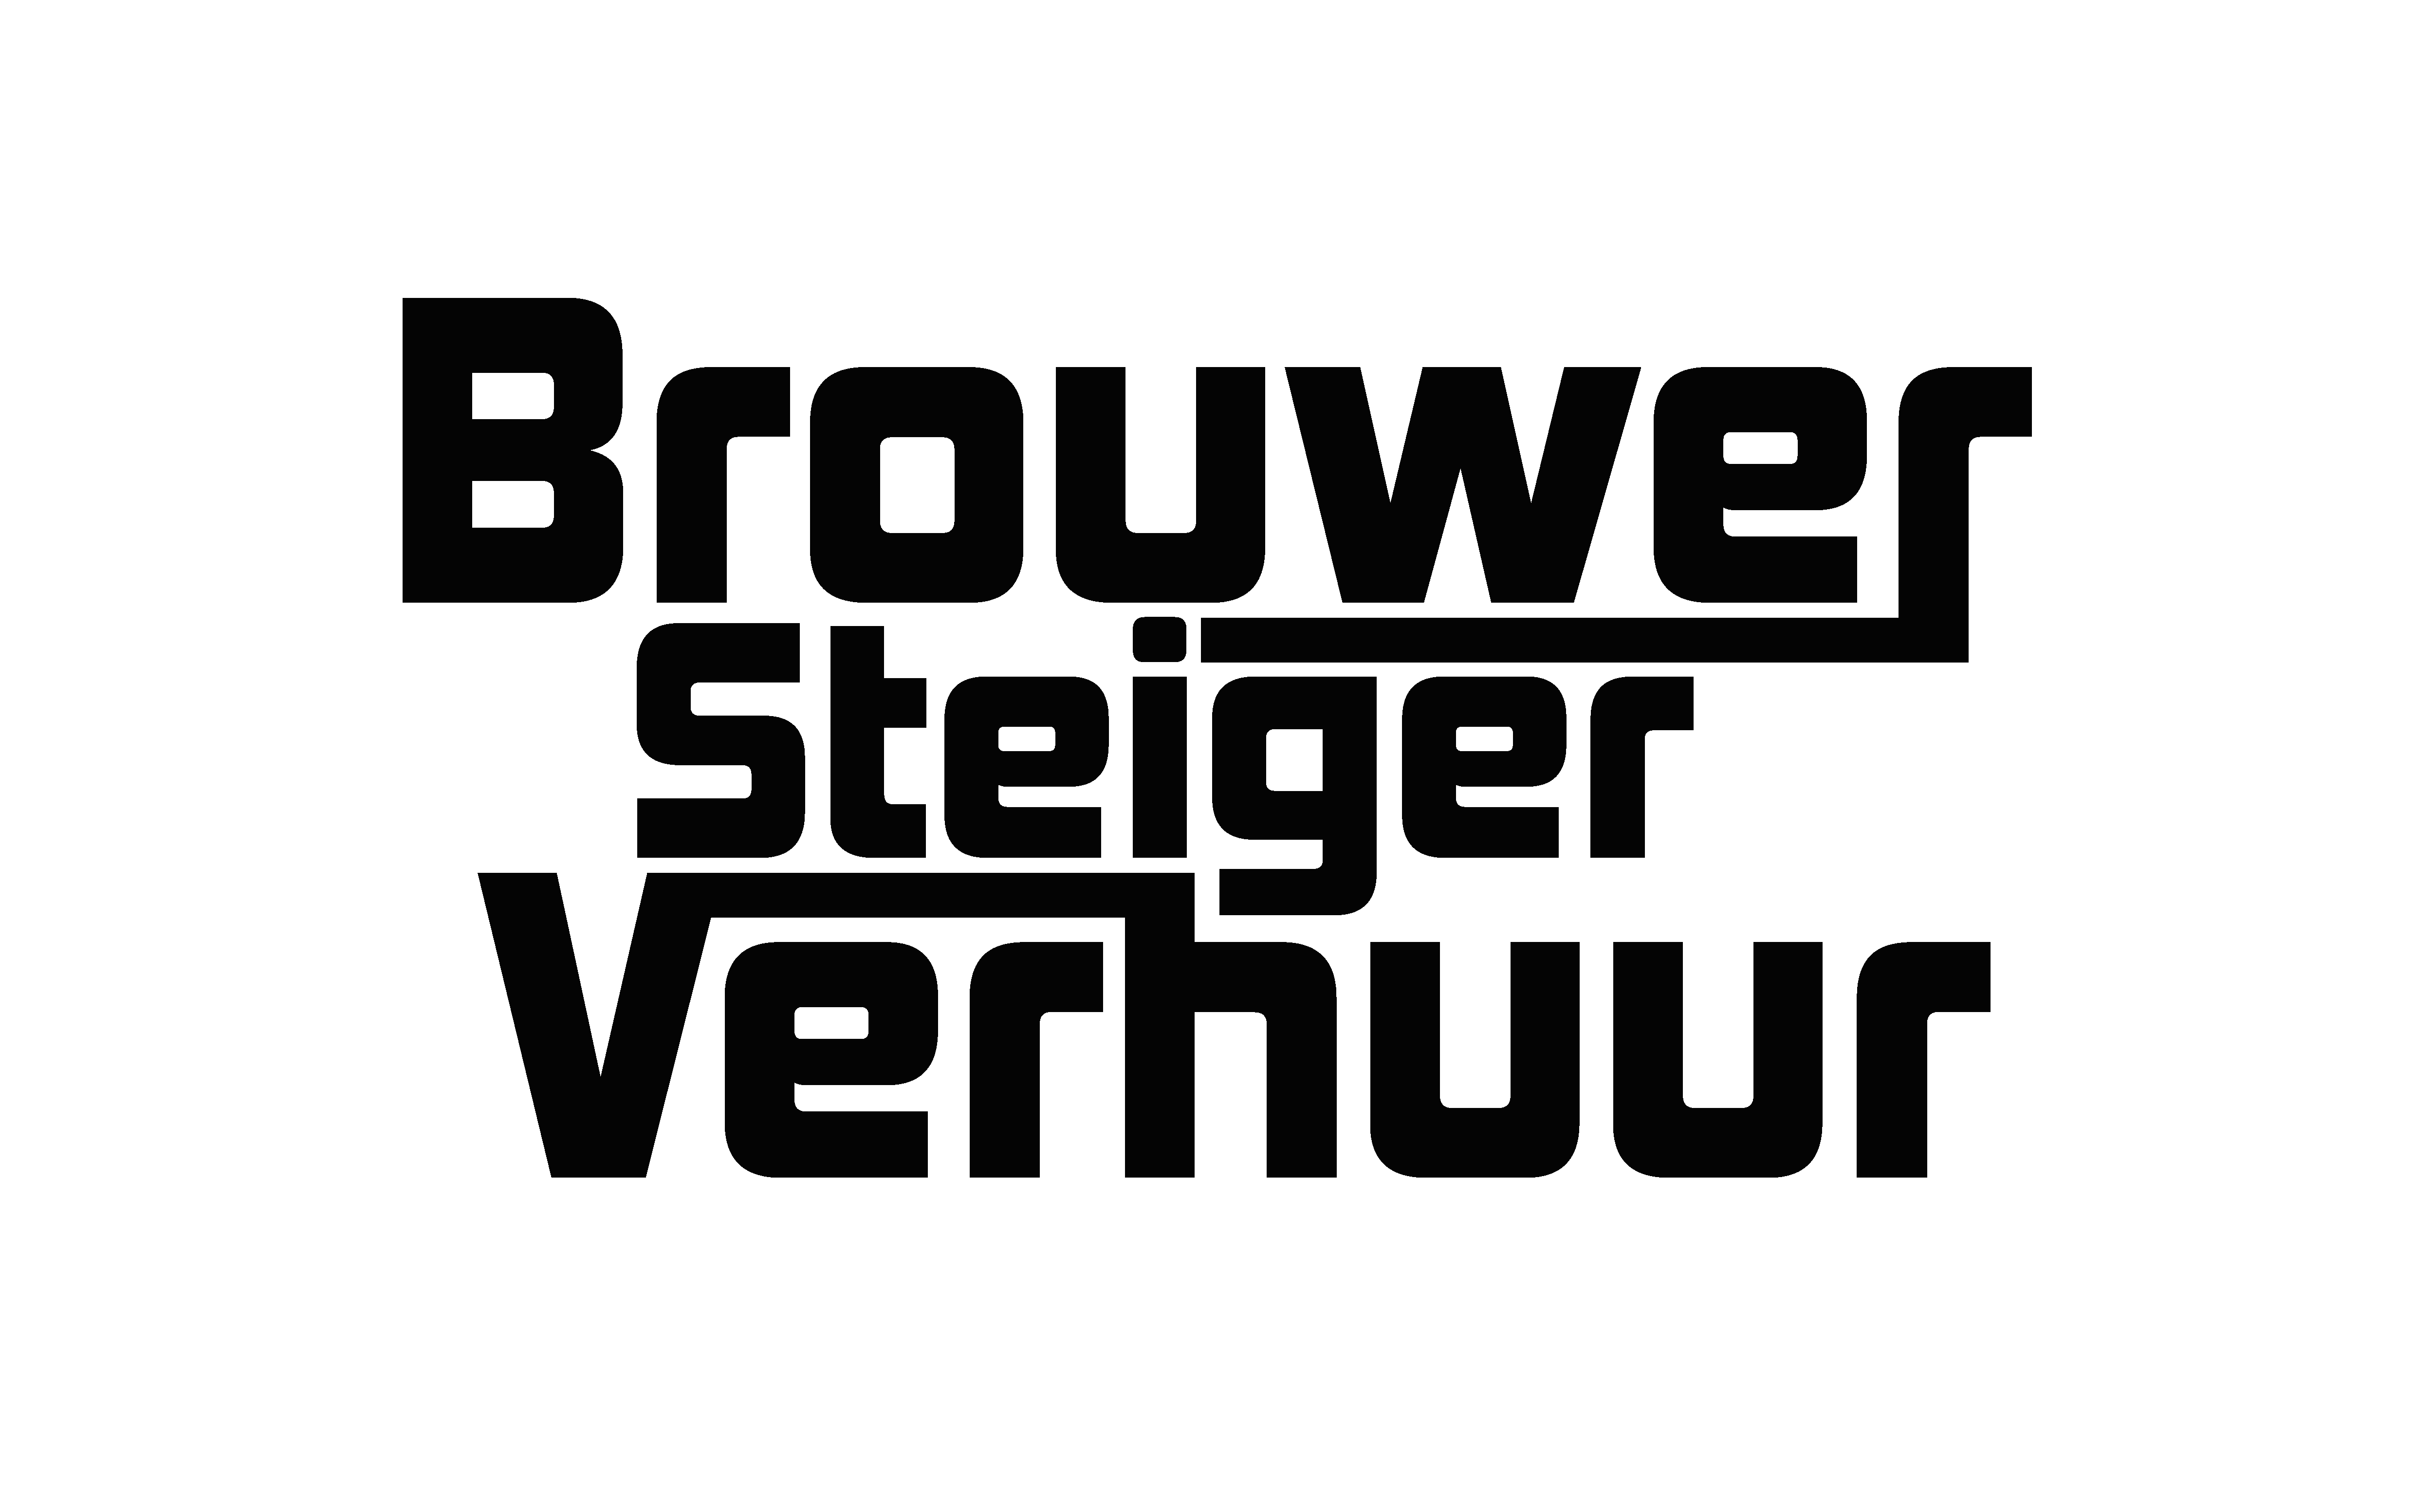 BSV logo